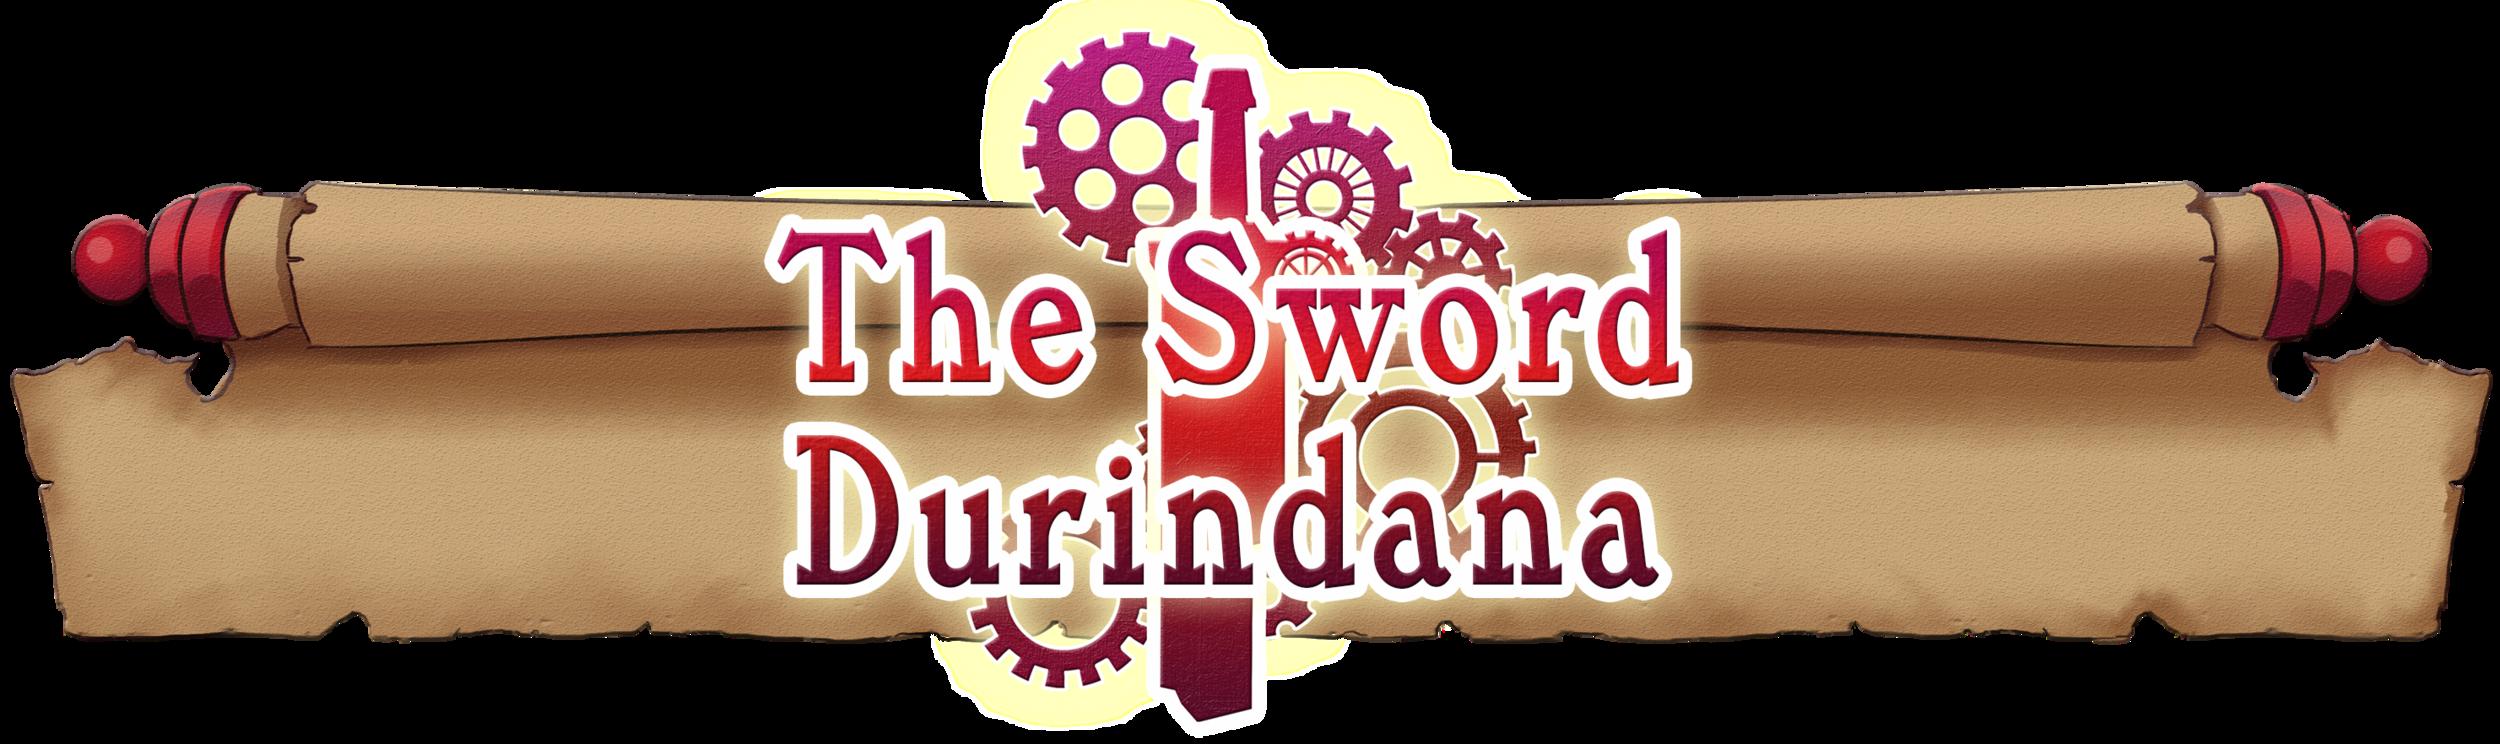 The Sword Durindana Paragraph.png